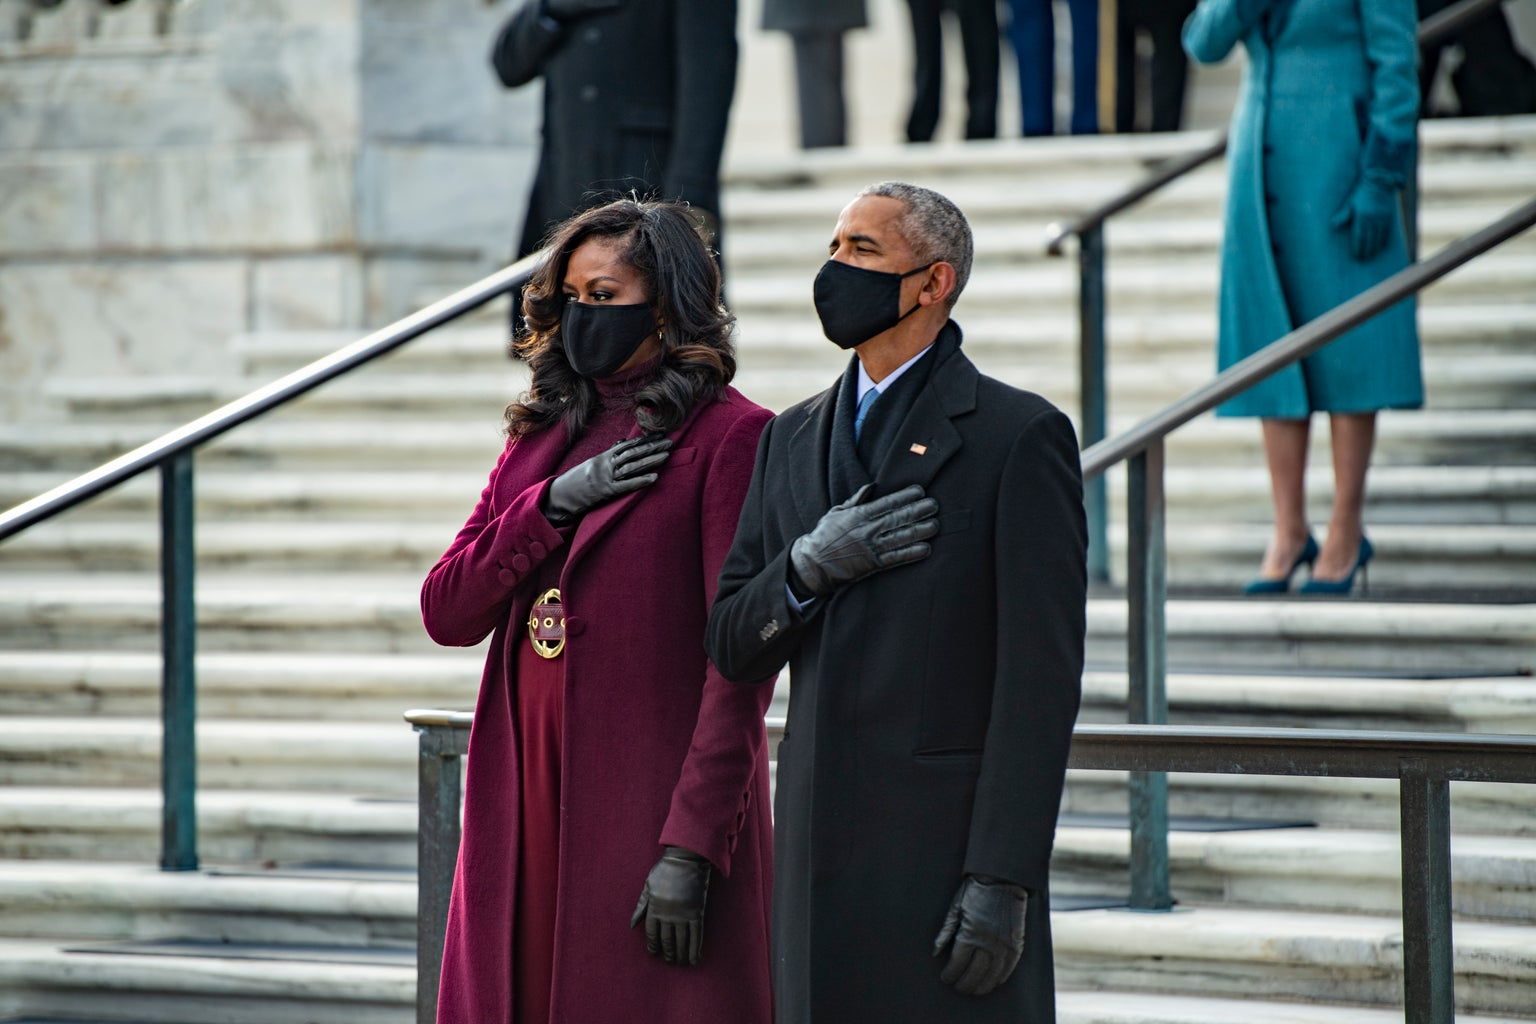 Michelle Obama and Barack Obama at the 2021 Inauguration